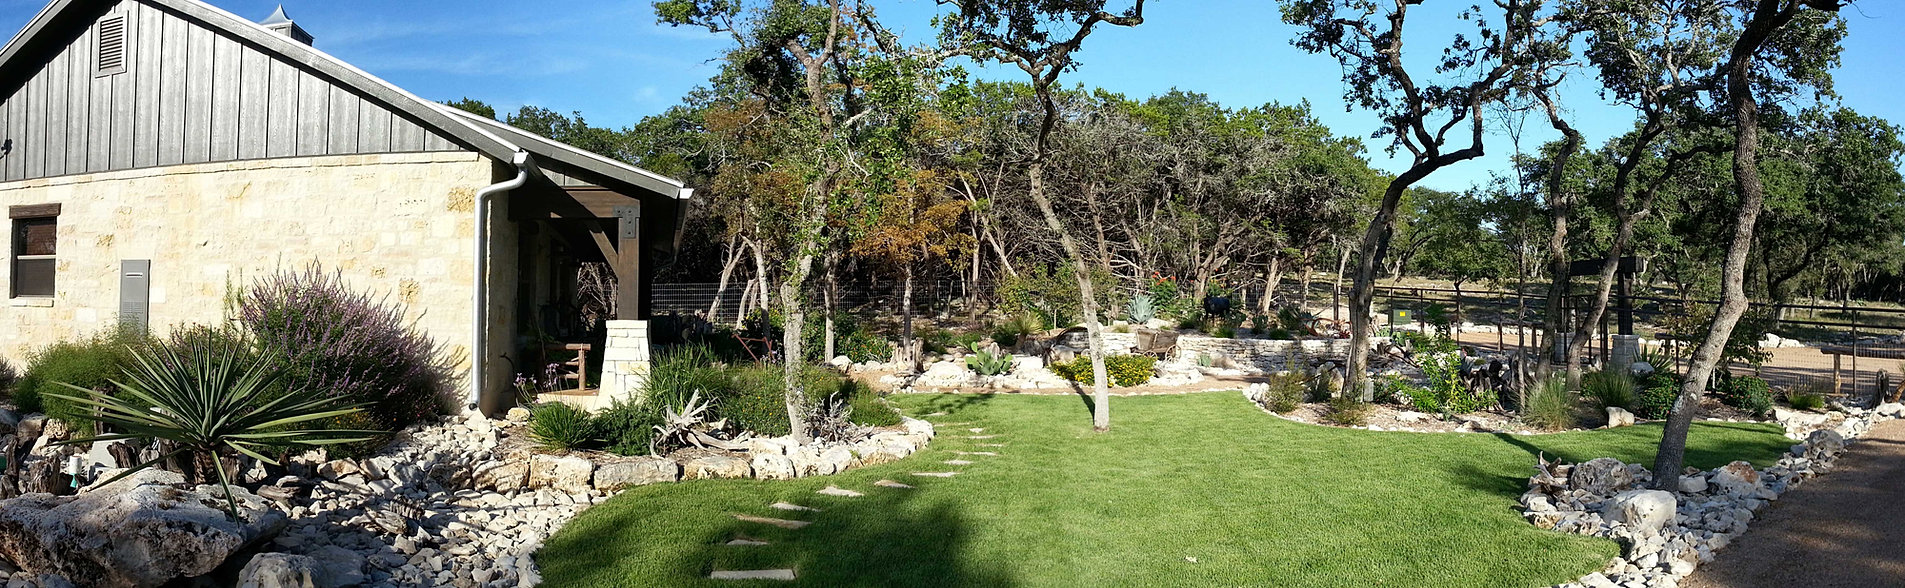 s a grows landscape services landscaping company san antonio texas